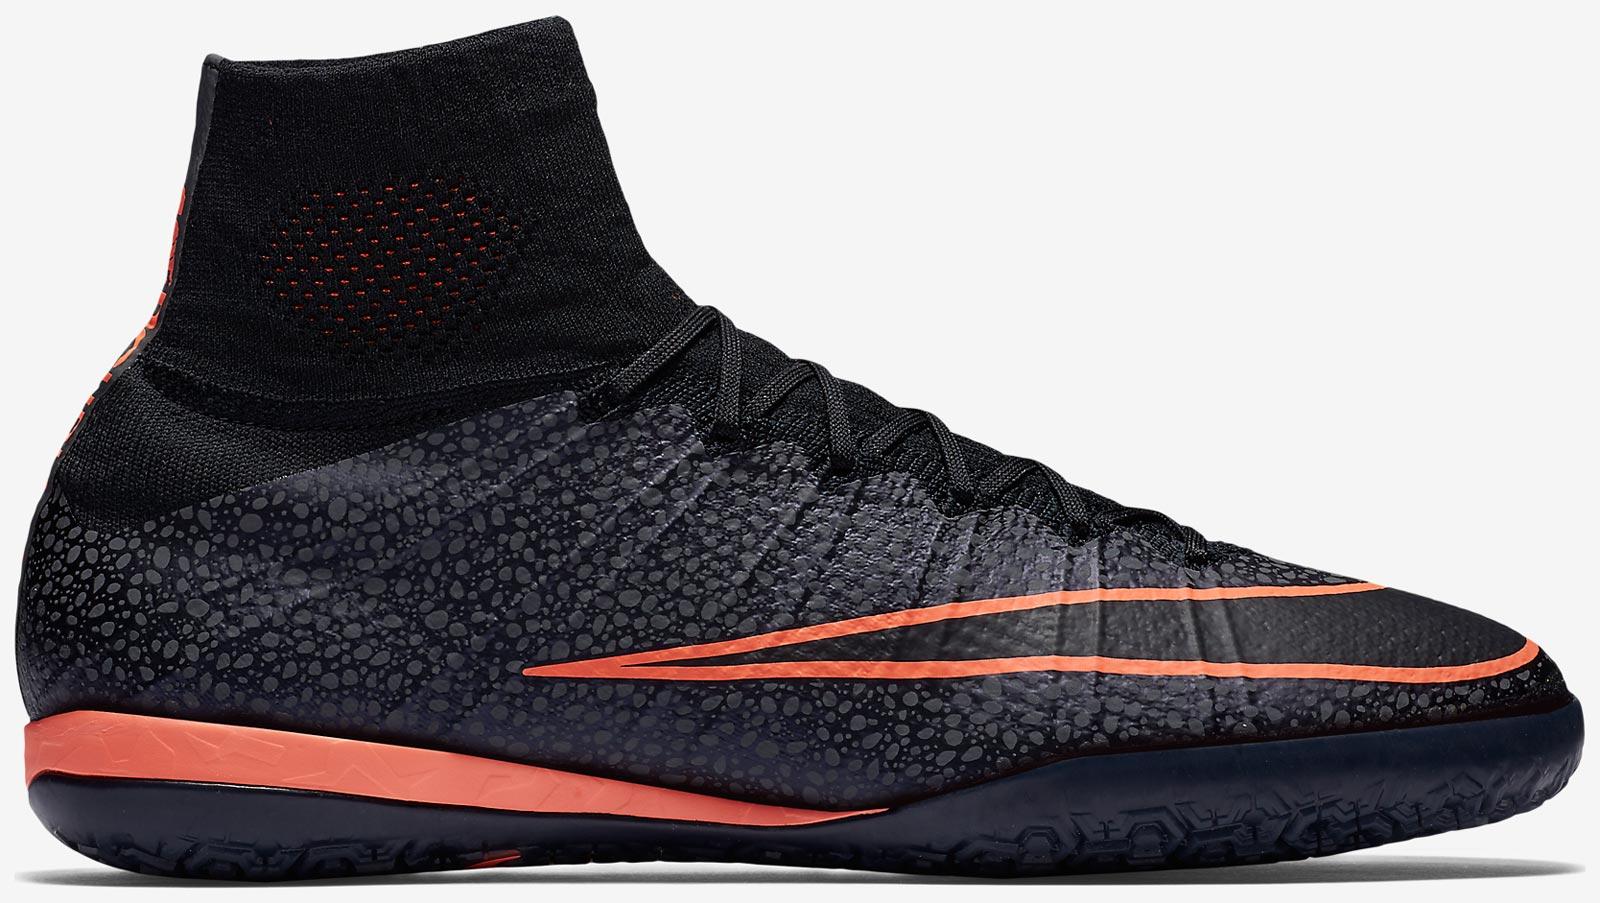 Pink Nike Mercurial Indoor Soccer Shoes